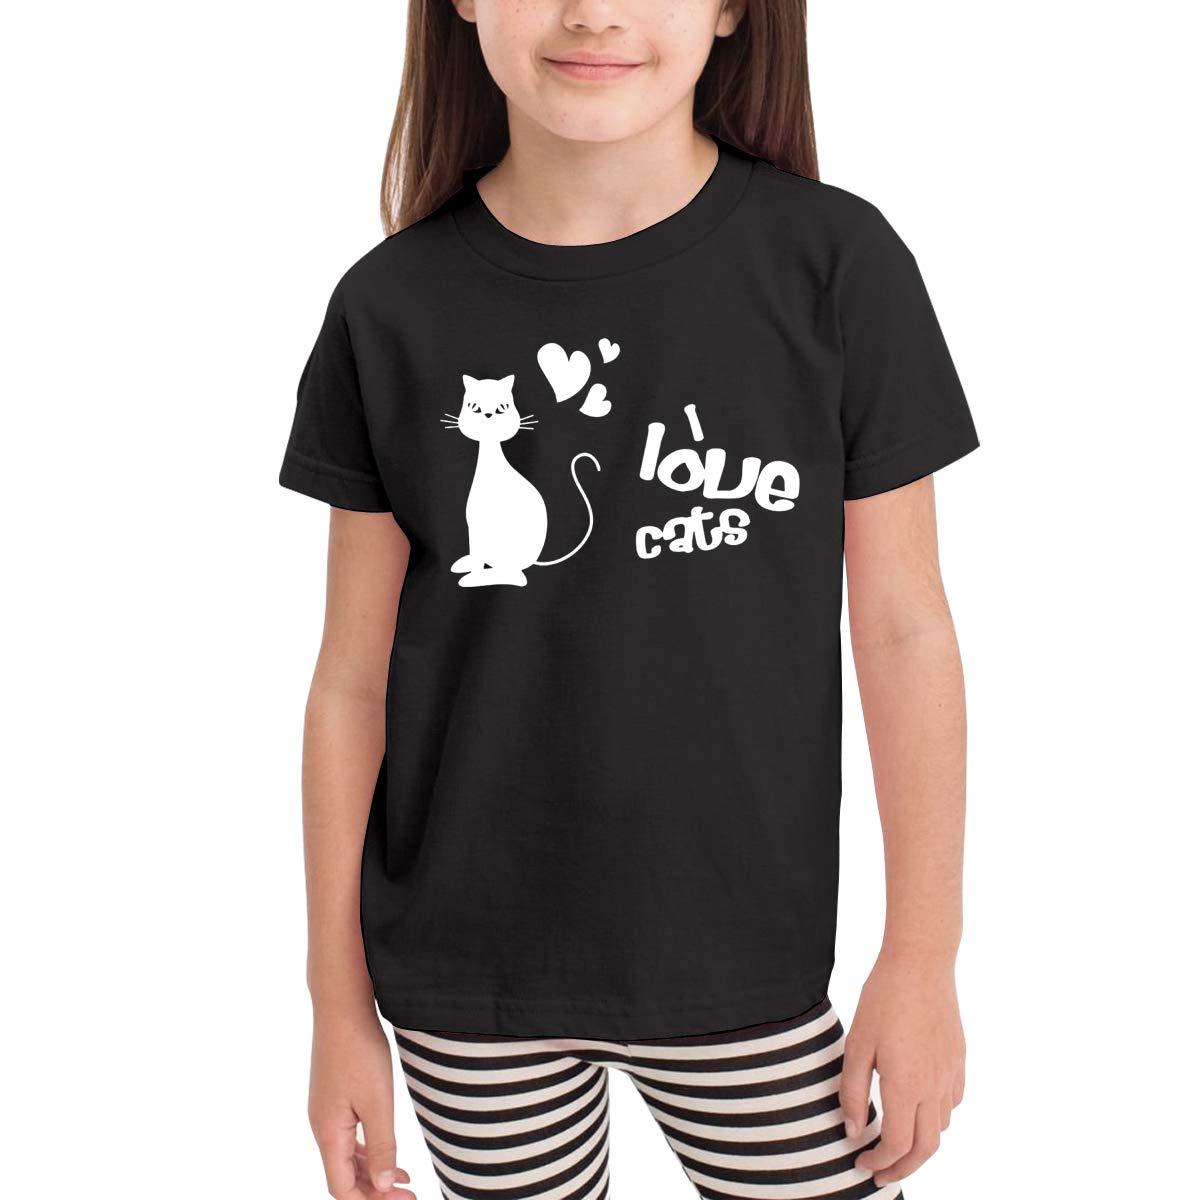 Toddler Boys Girls Kids Cute Tops I Love Cats Print Short Sleeve Fashion Black T Shirt Blouse